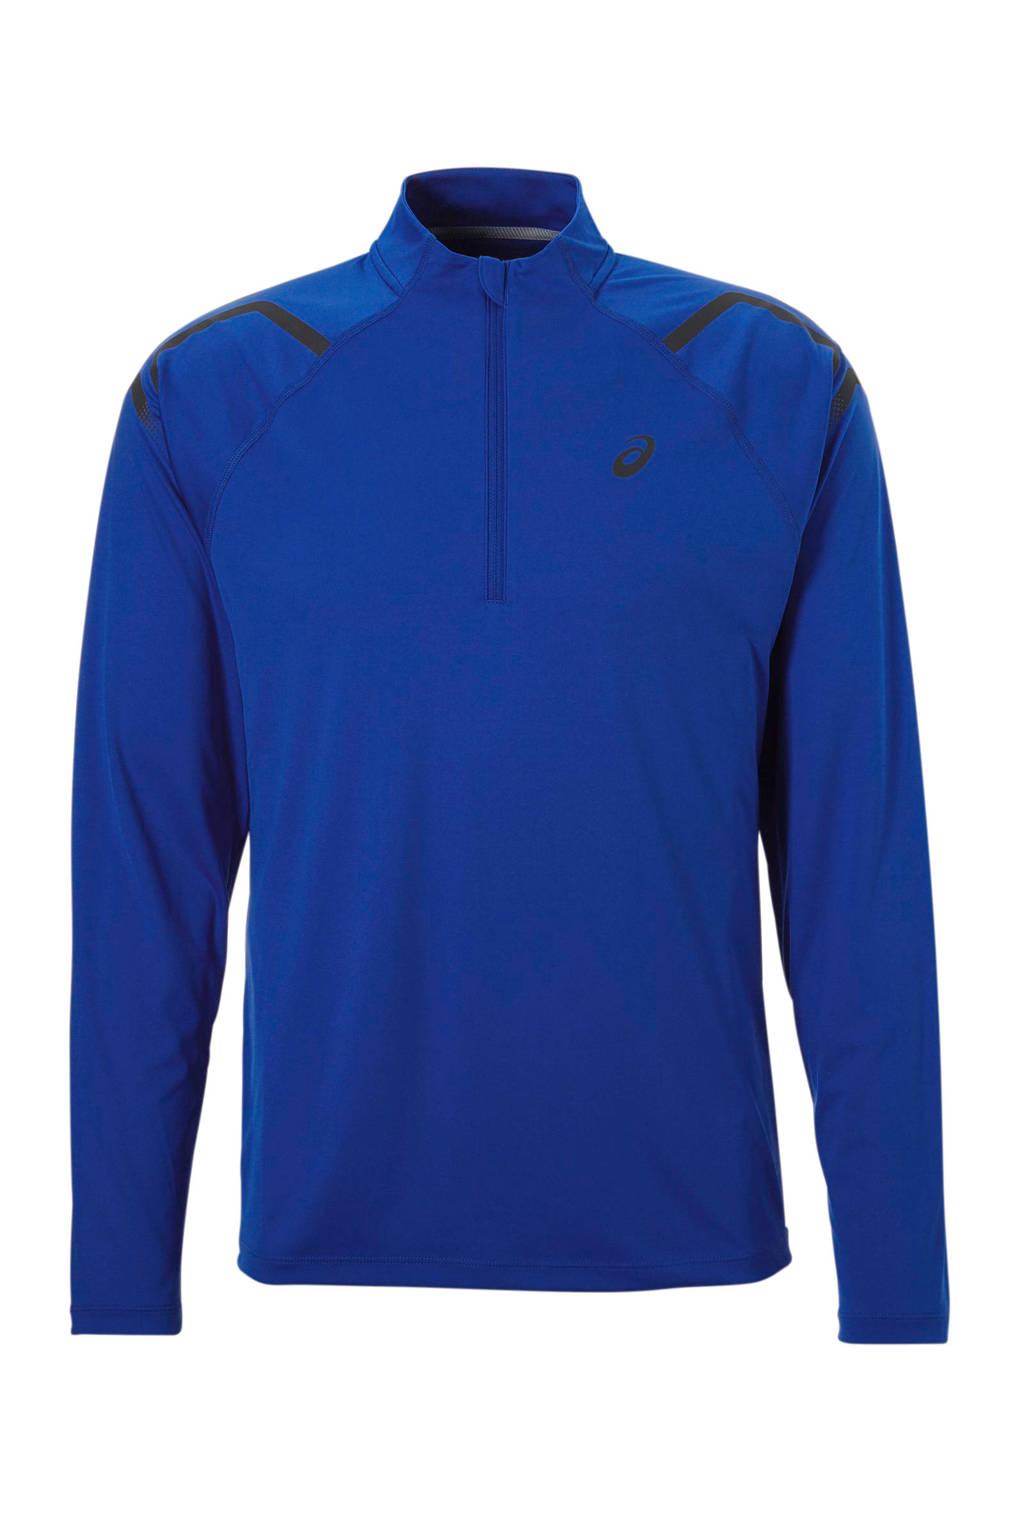 ASICS   hardloop T-shirt blauw, Blauw